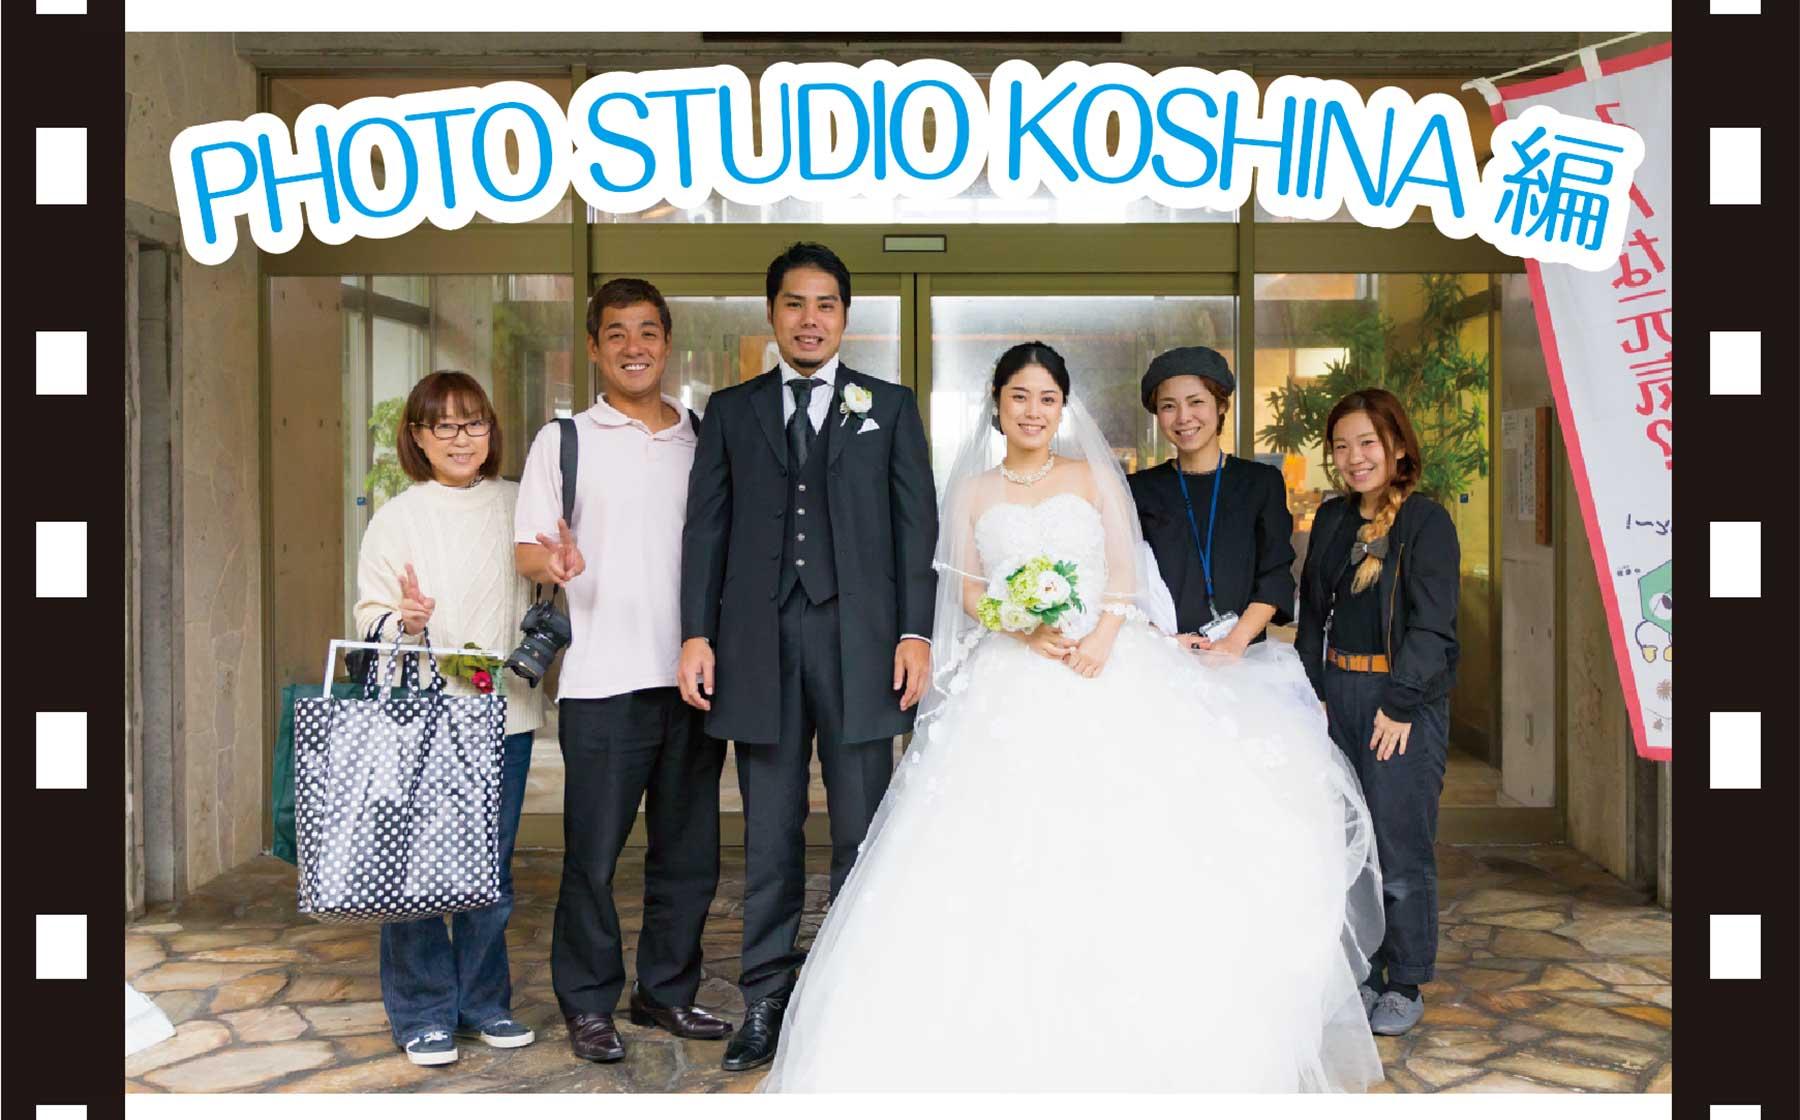 photo studio koshina ウェディングバナー